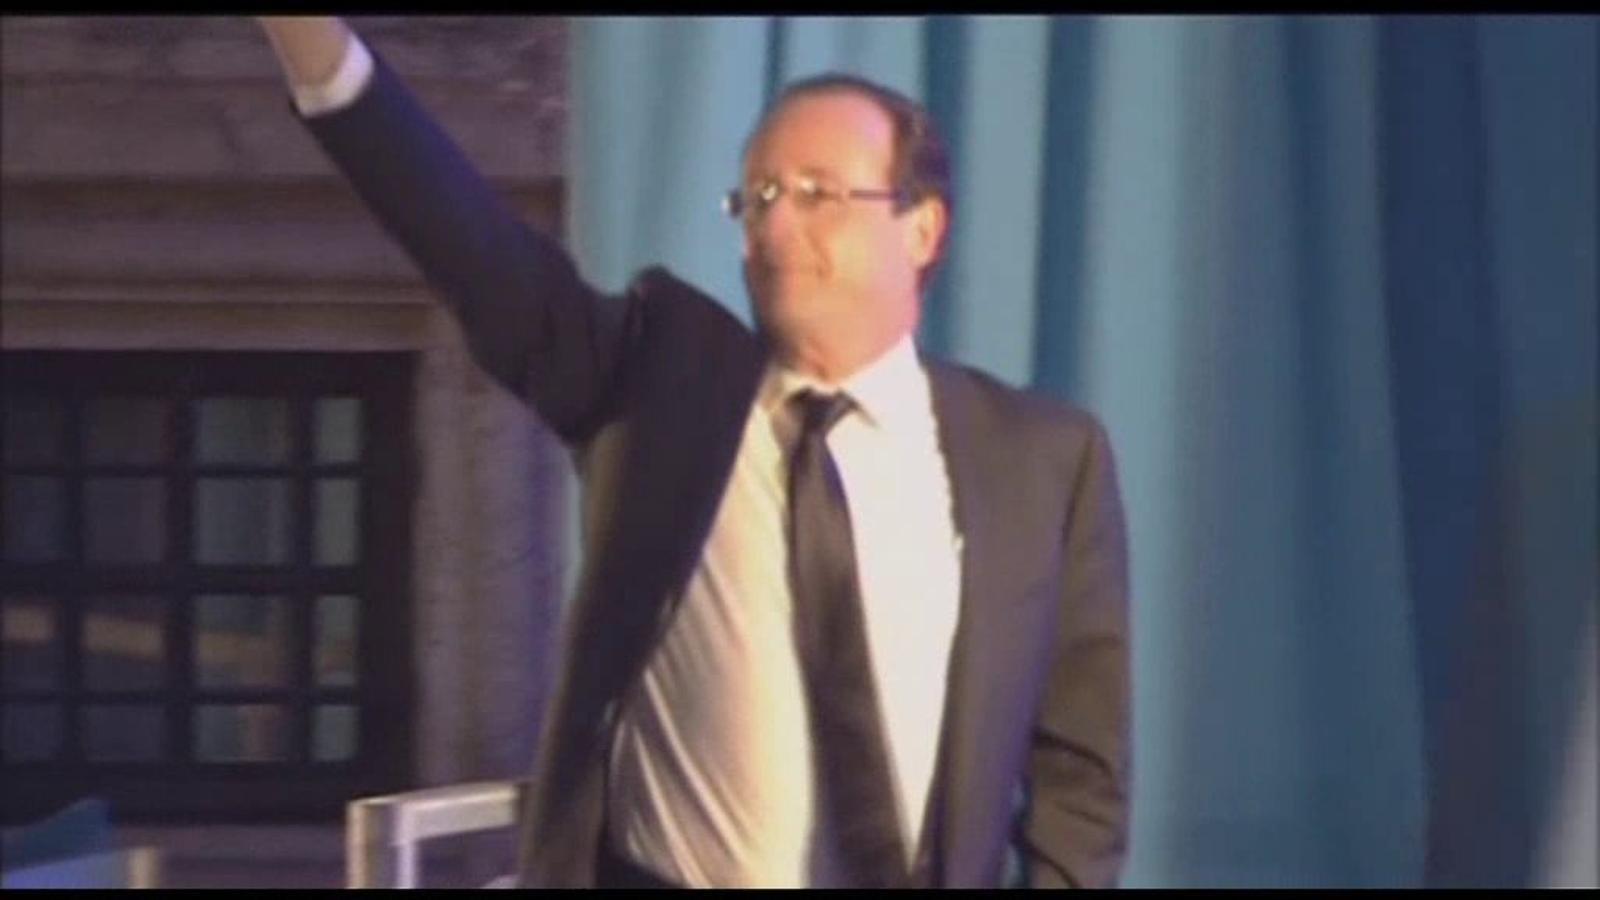 Hollande, nou president de França